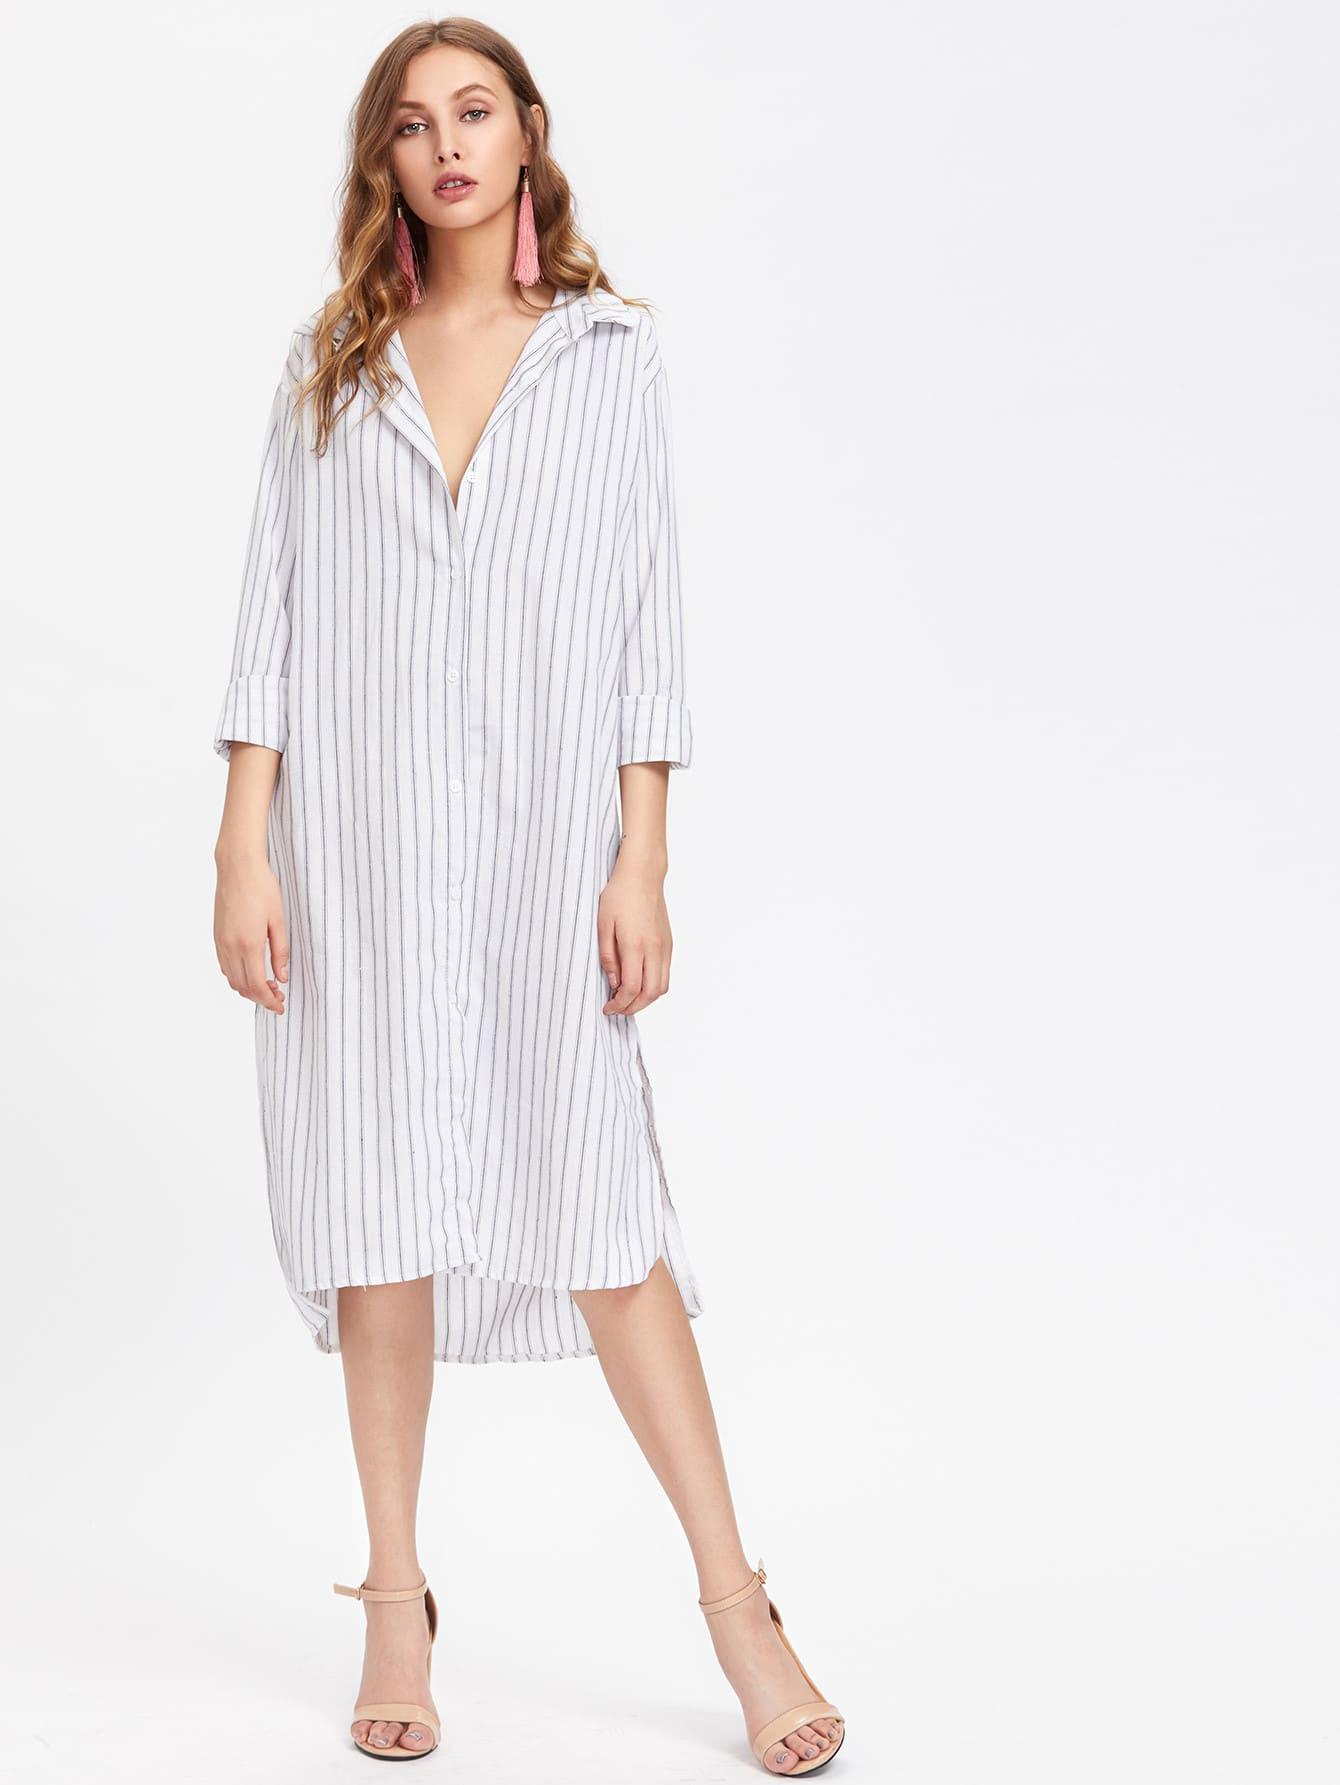 110b590f83 Vertical Striped Slit Side Dip Hem Shirt Dress EmmaCloth-Women ...